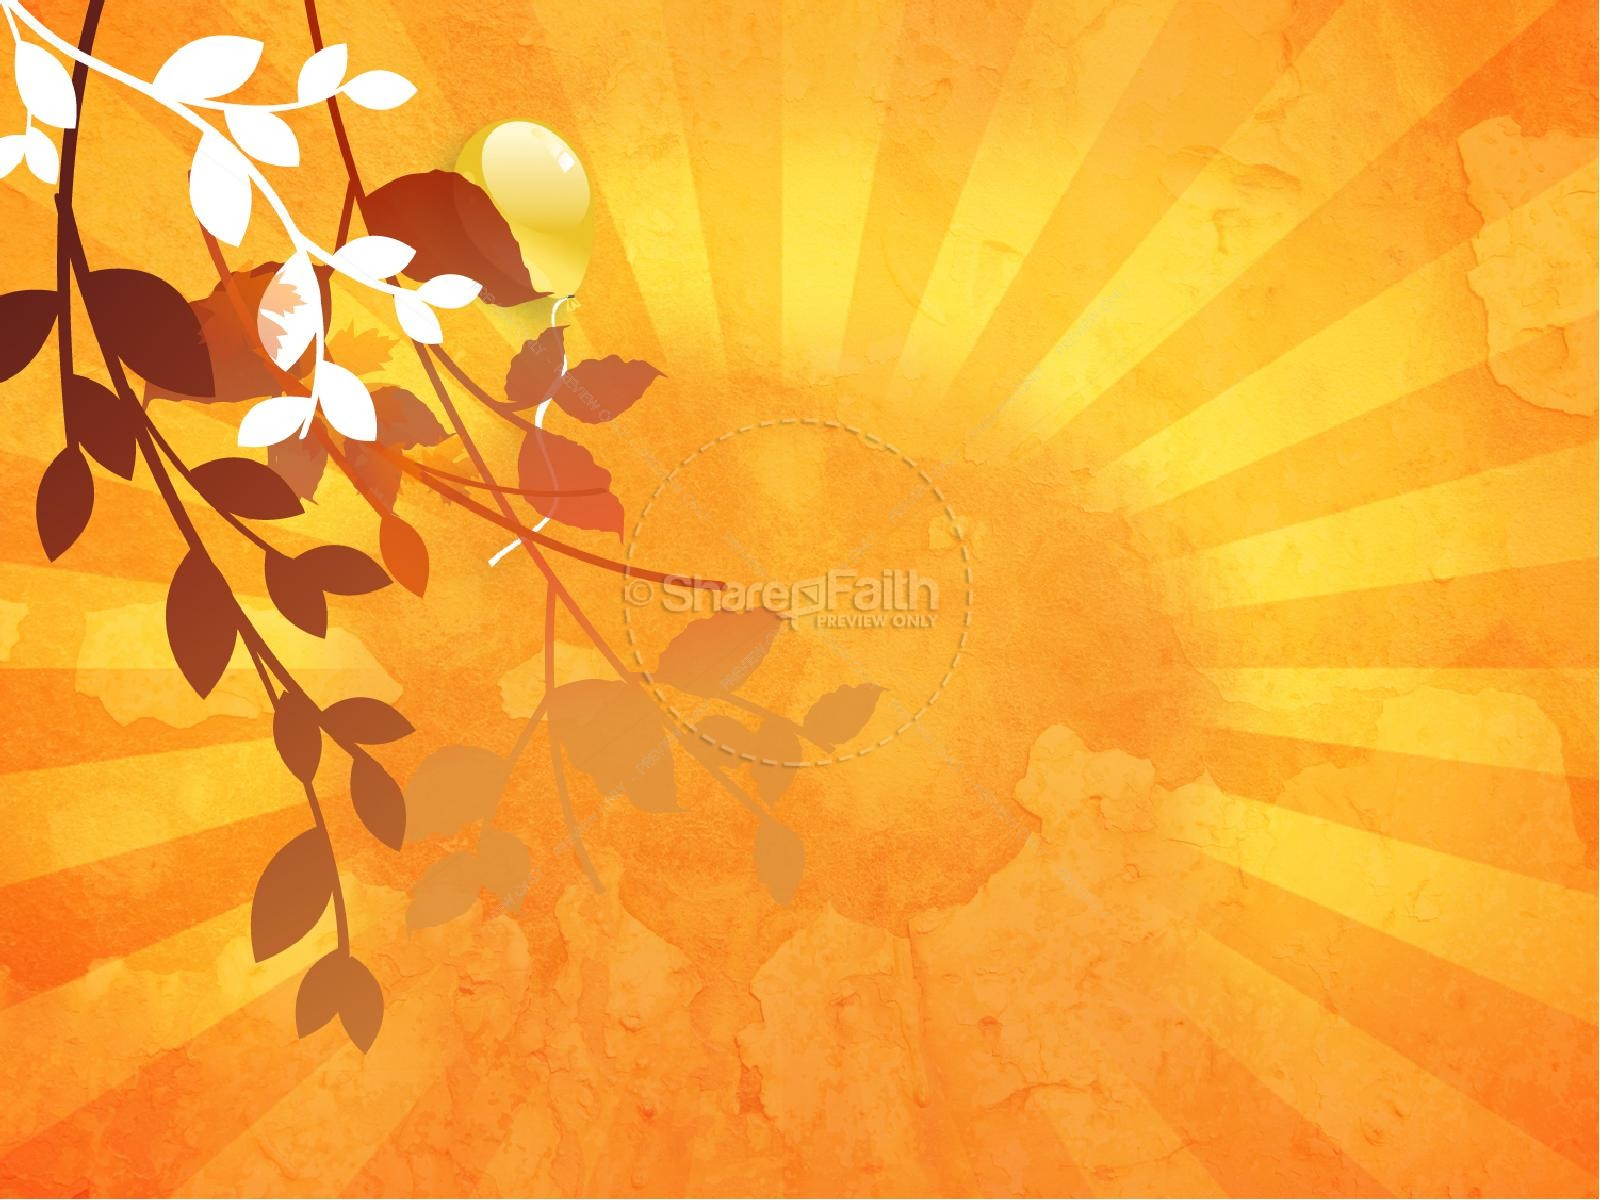 Fall Celebration Church PowerPoint